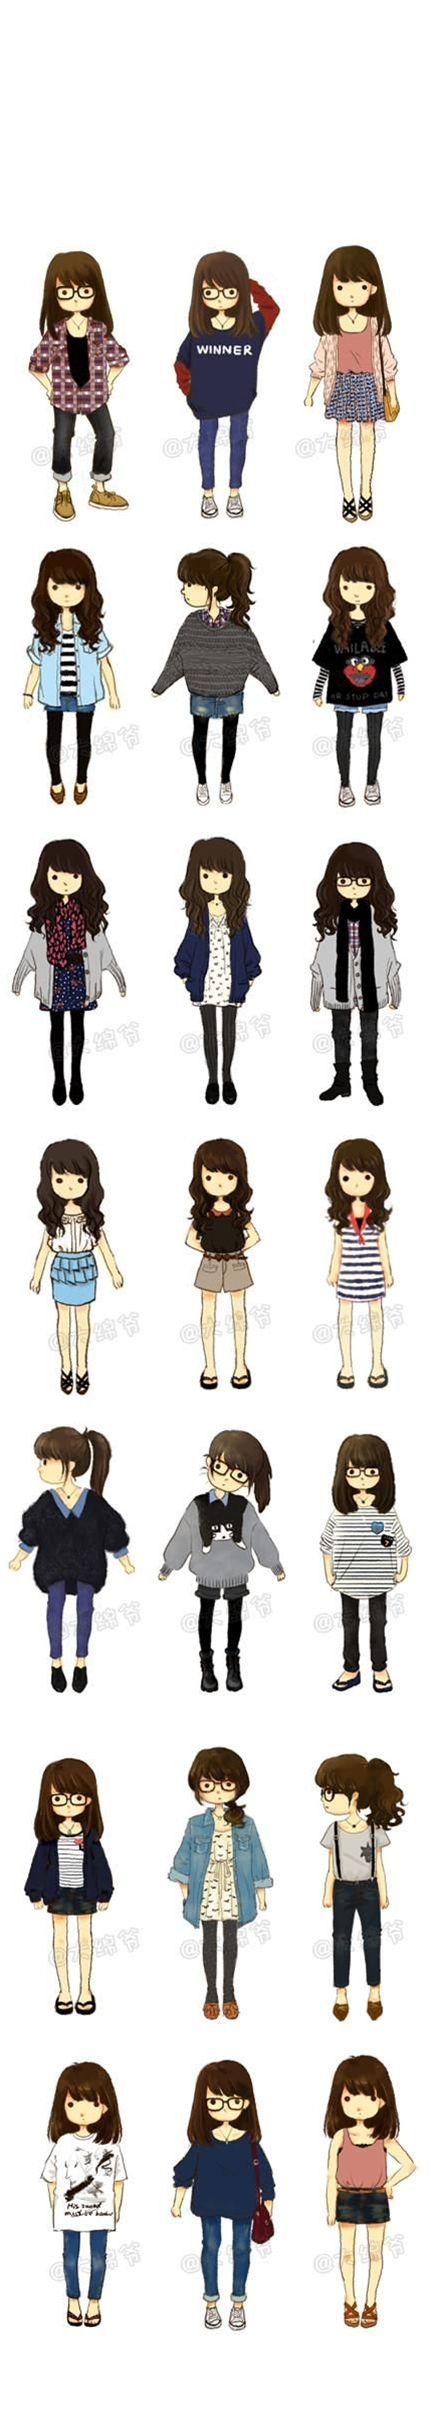 Illustrator นั่งมีฤดูกาลที่สดใหม่ขนาดเล็กที่มี  น้องสาวของ Hao 萌  ผู้เขียนหัวข้อ: